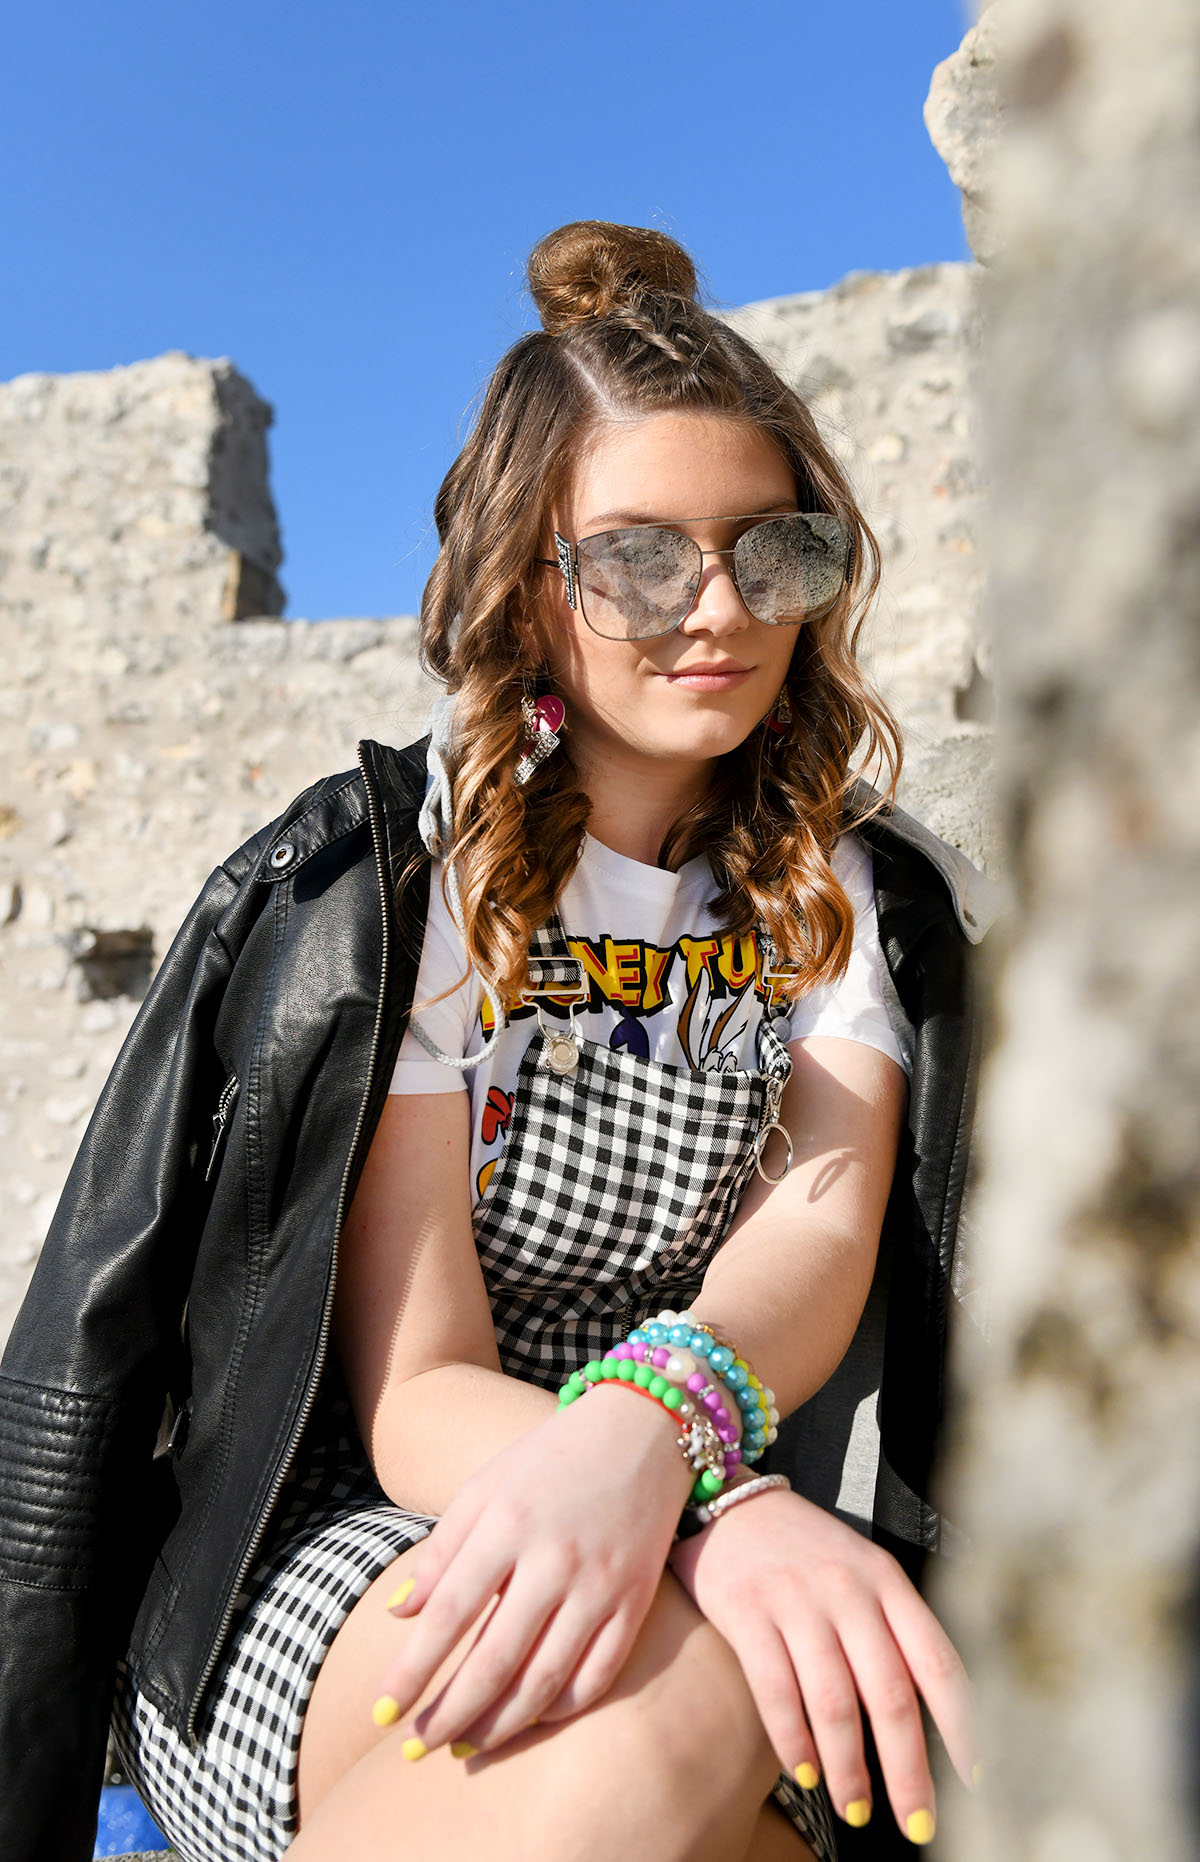 Extravagant editorials: Ztc teen star